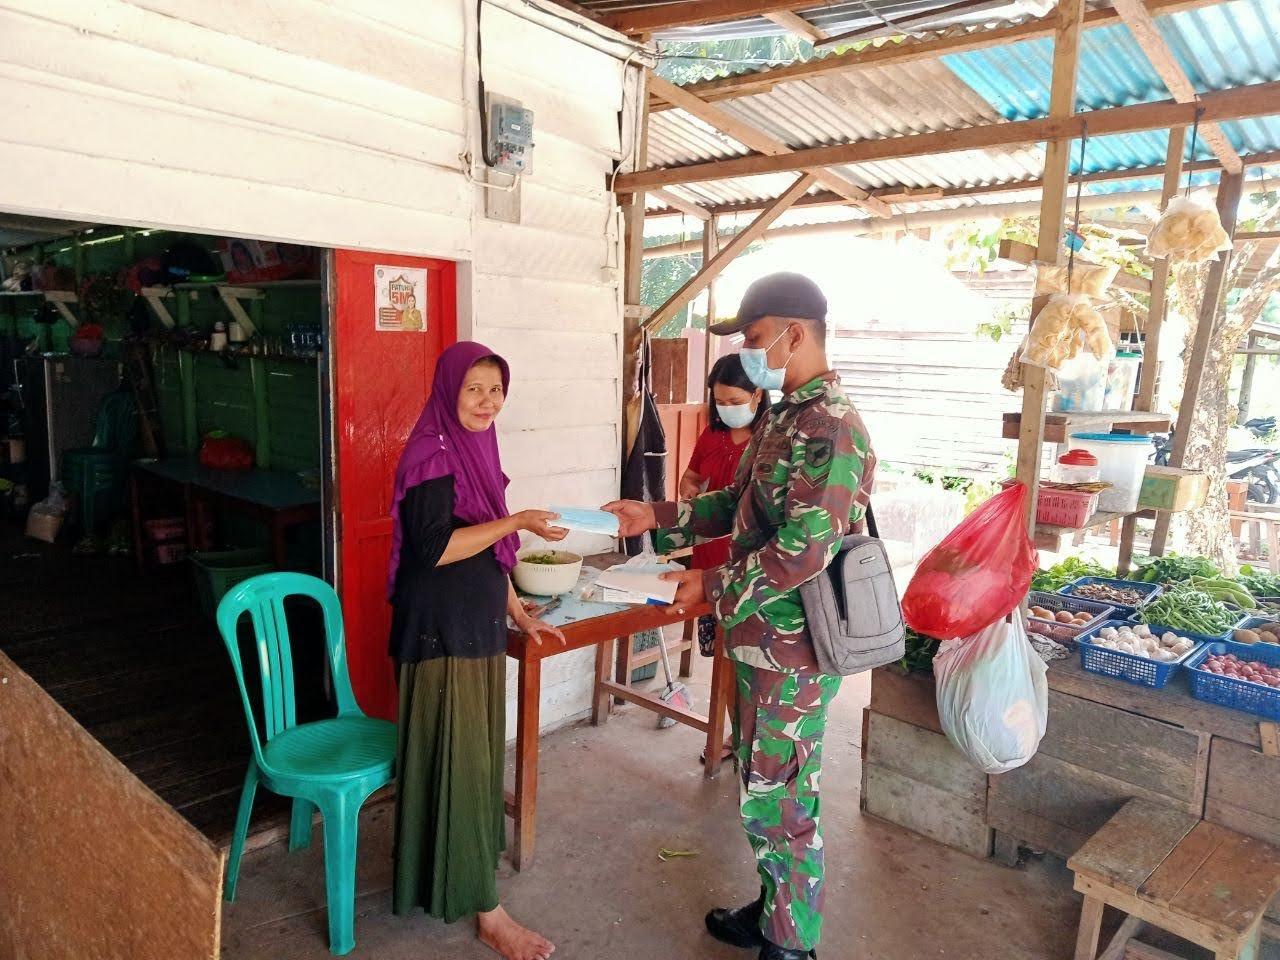 ZIDAM XII/TPR Lakukan Giat Stop Covid 19 Di Dusun Jamai Plasma V Desa Amboyo Kecamatan Ngabang Kabupaten Landak